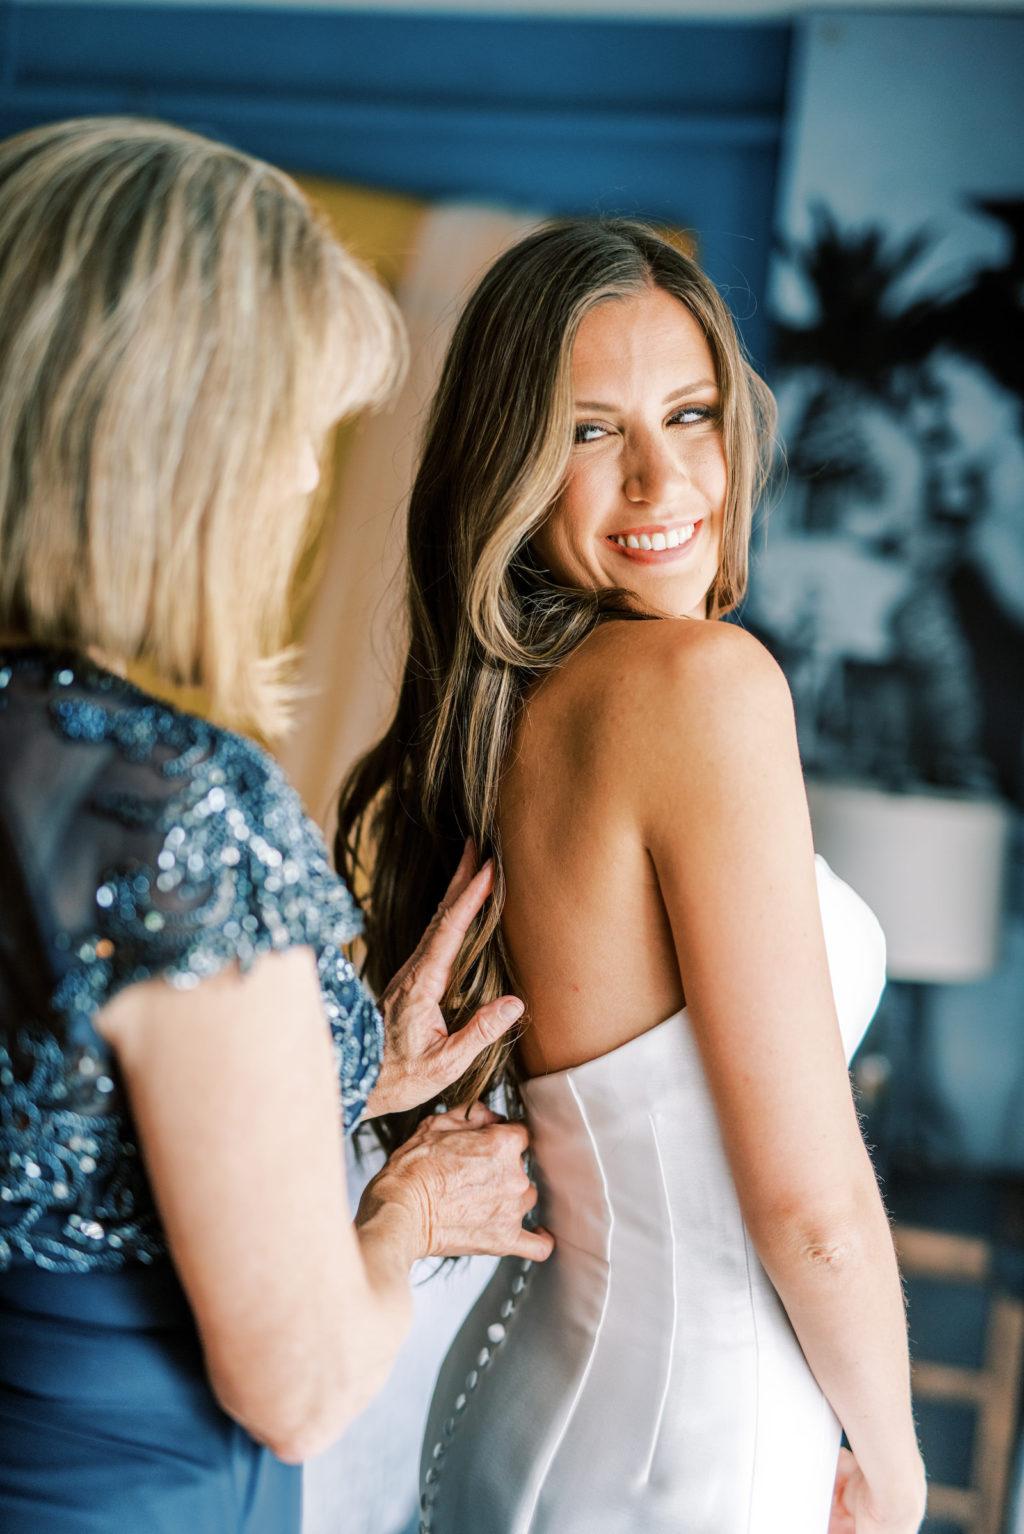 Florida Bride with Mom Putting Wedding Dress On | Tampa Bay Wedding Photographer Kera Photography | Wedding Hair and Makeup Femme Akoi Beauty Studio